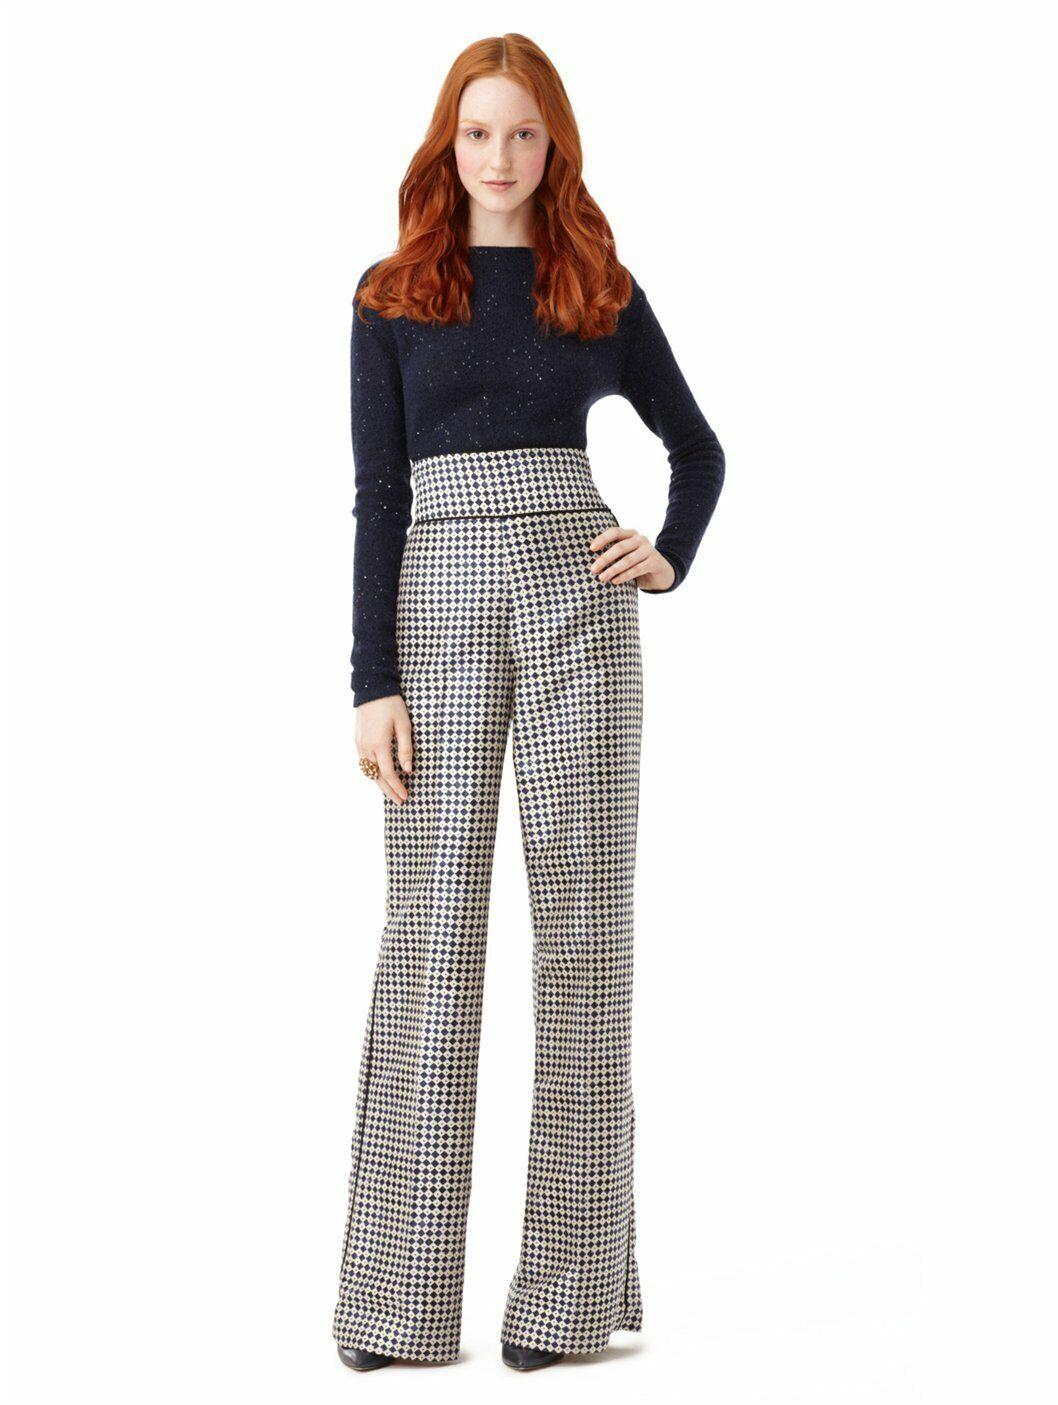 Oscar de La Renta NWT Size 2 Silk High Waist Diamond Print Wide Leg Pants